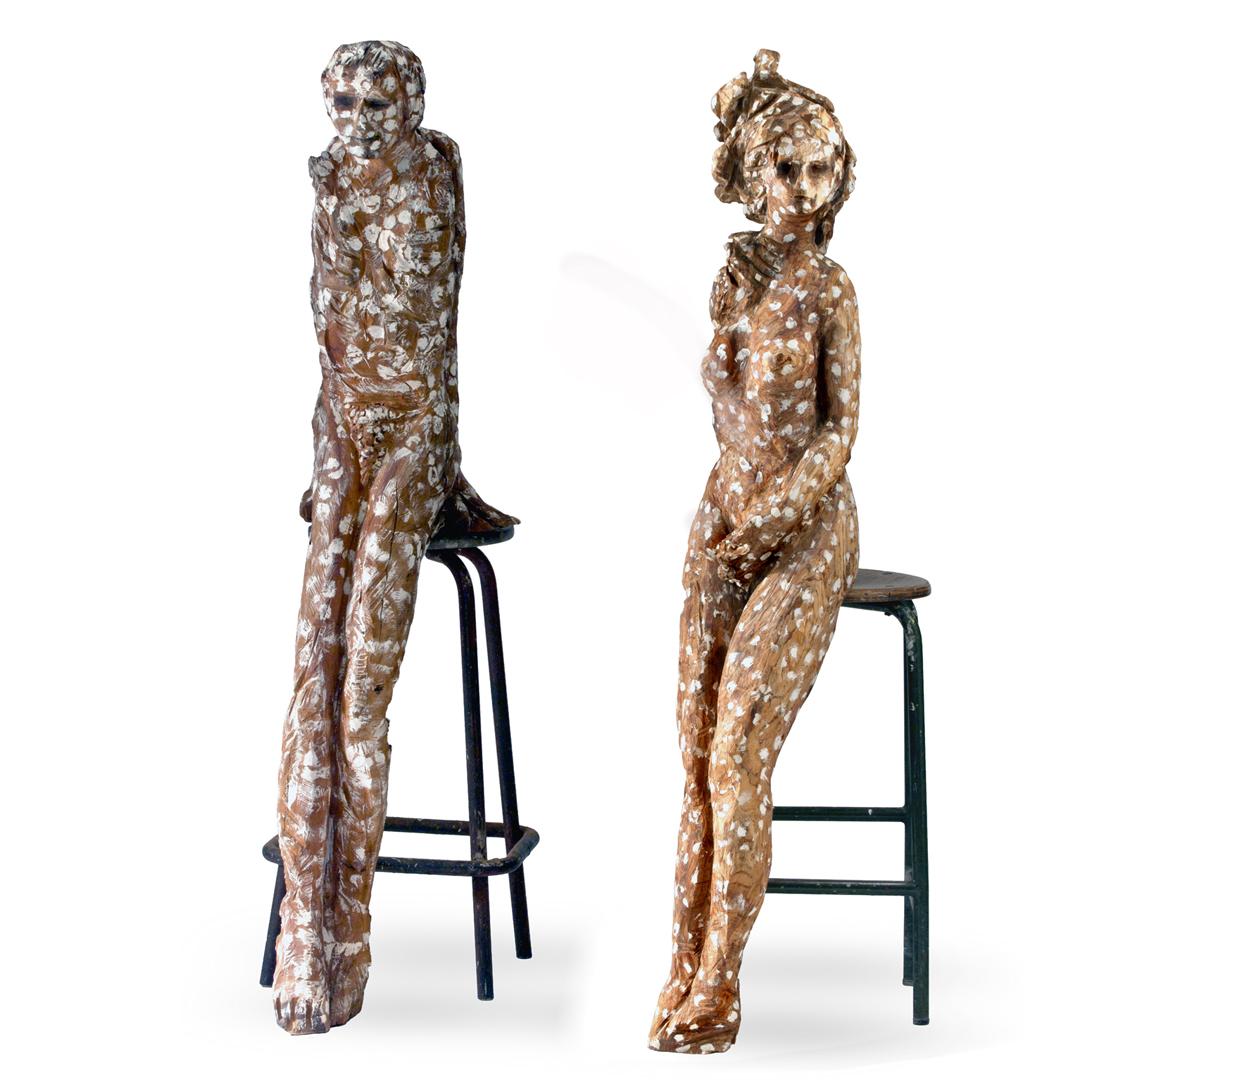 Grappe I et II, 160x70x38 cm